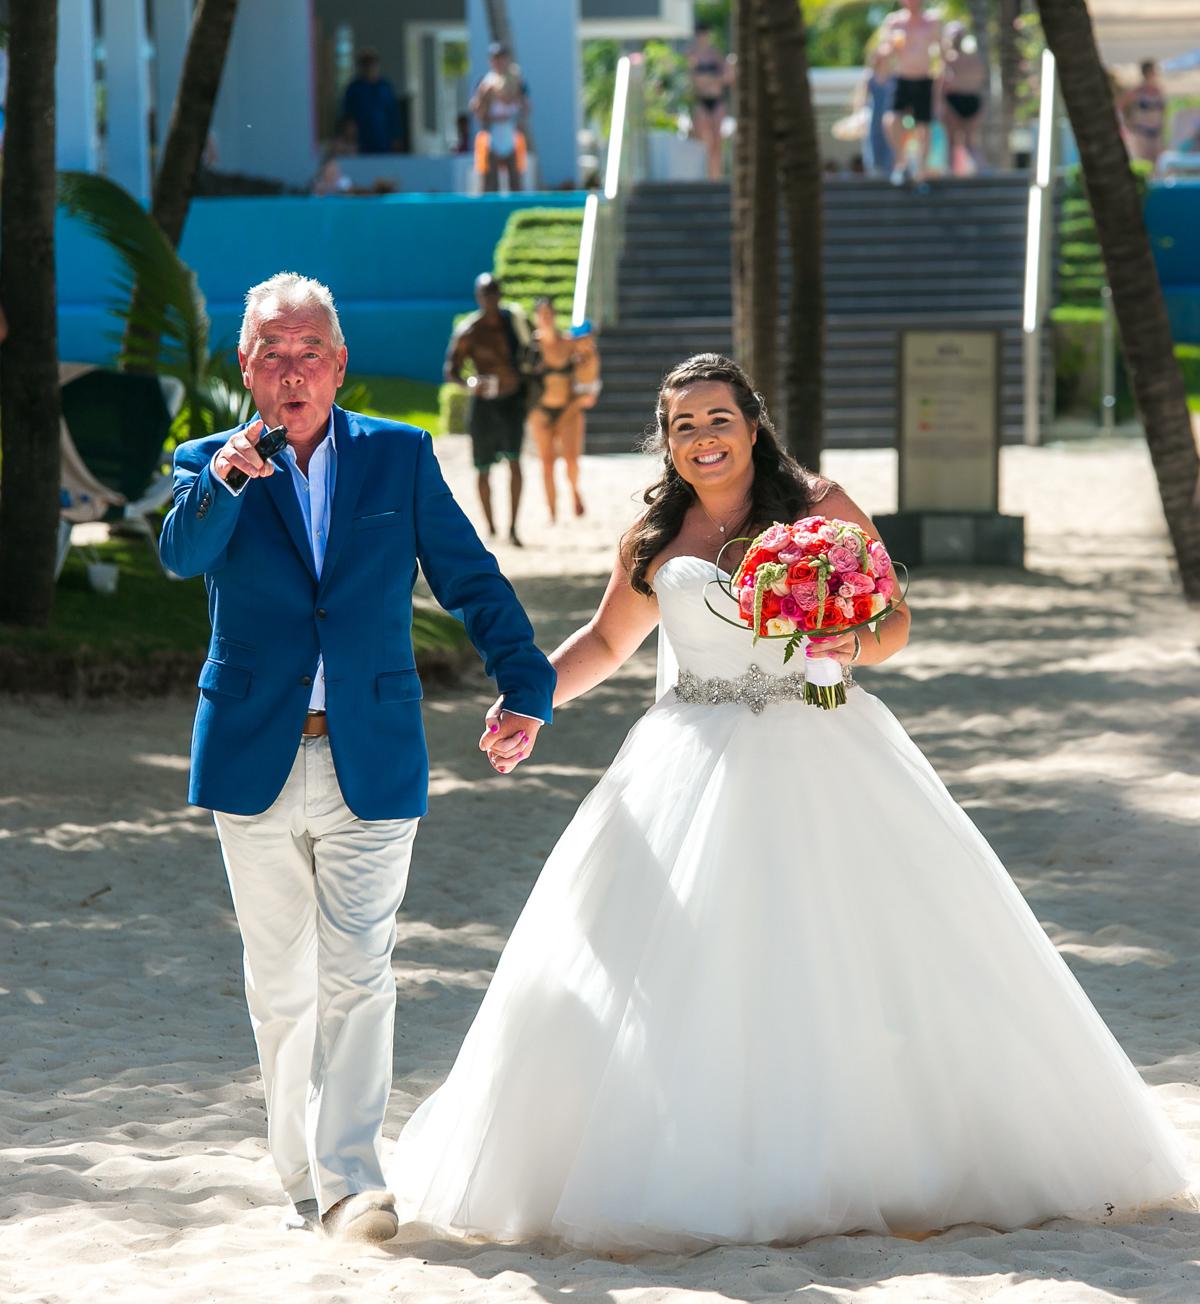 naomi daniel playa del carmen wedding riu palace mexico 01 9 - Naomi & Daniel - Riu Palace Mexico